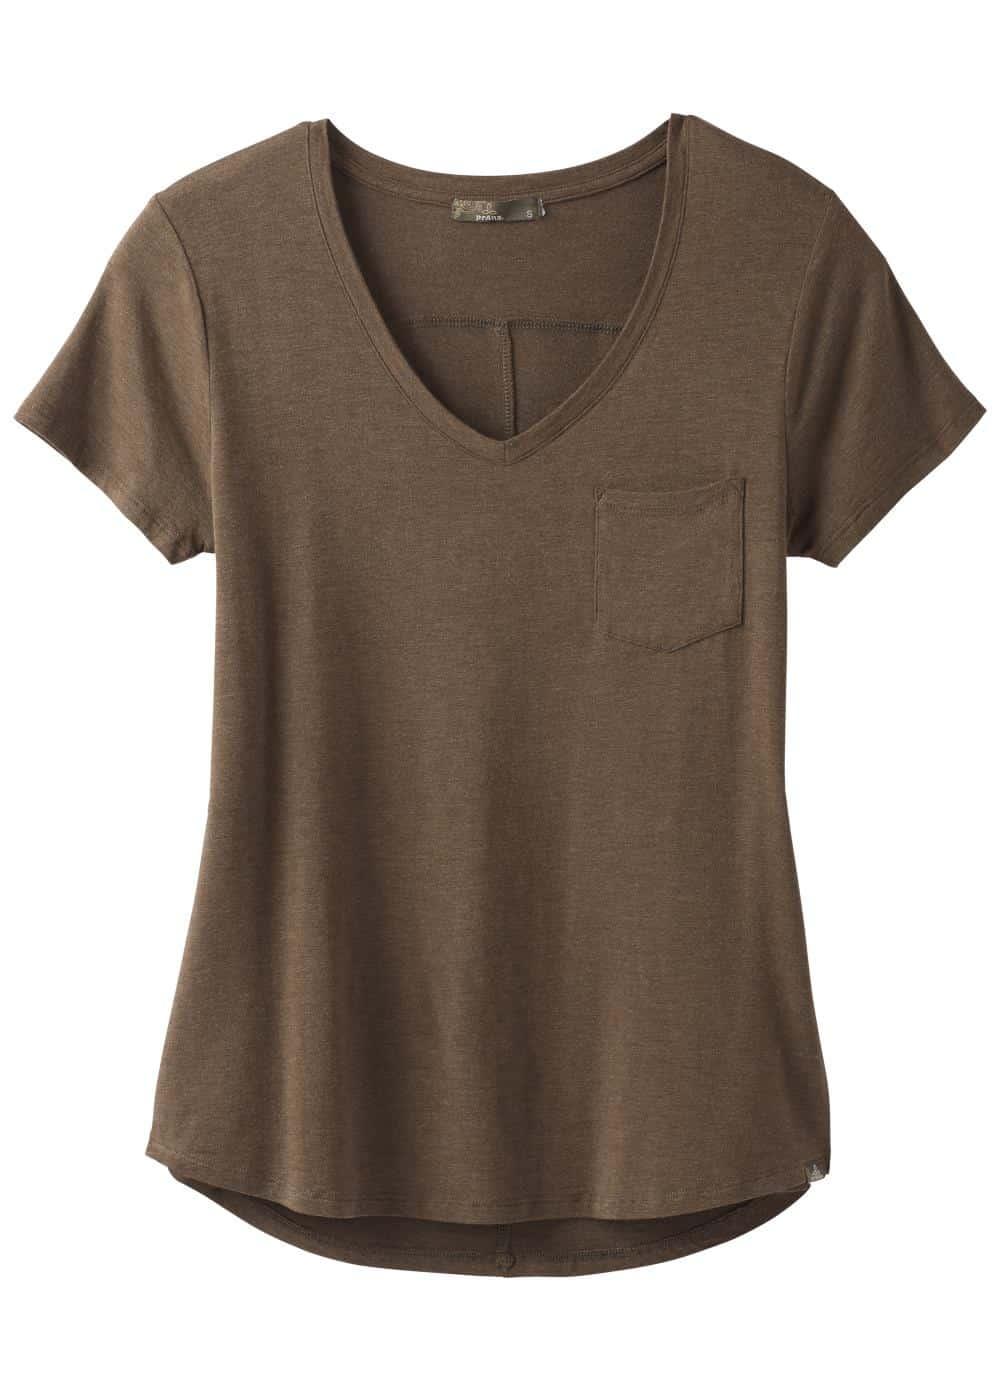 prAna-Foundation Short-Sleeve V Neck Top - Women's